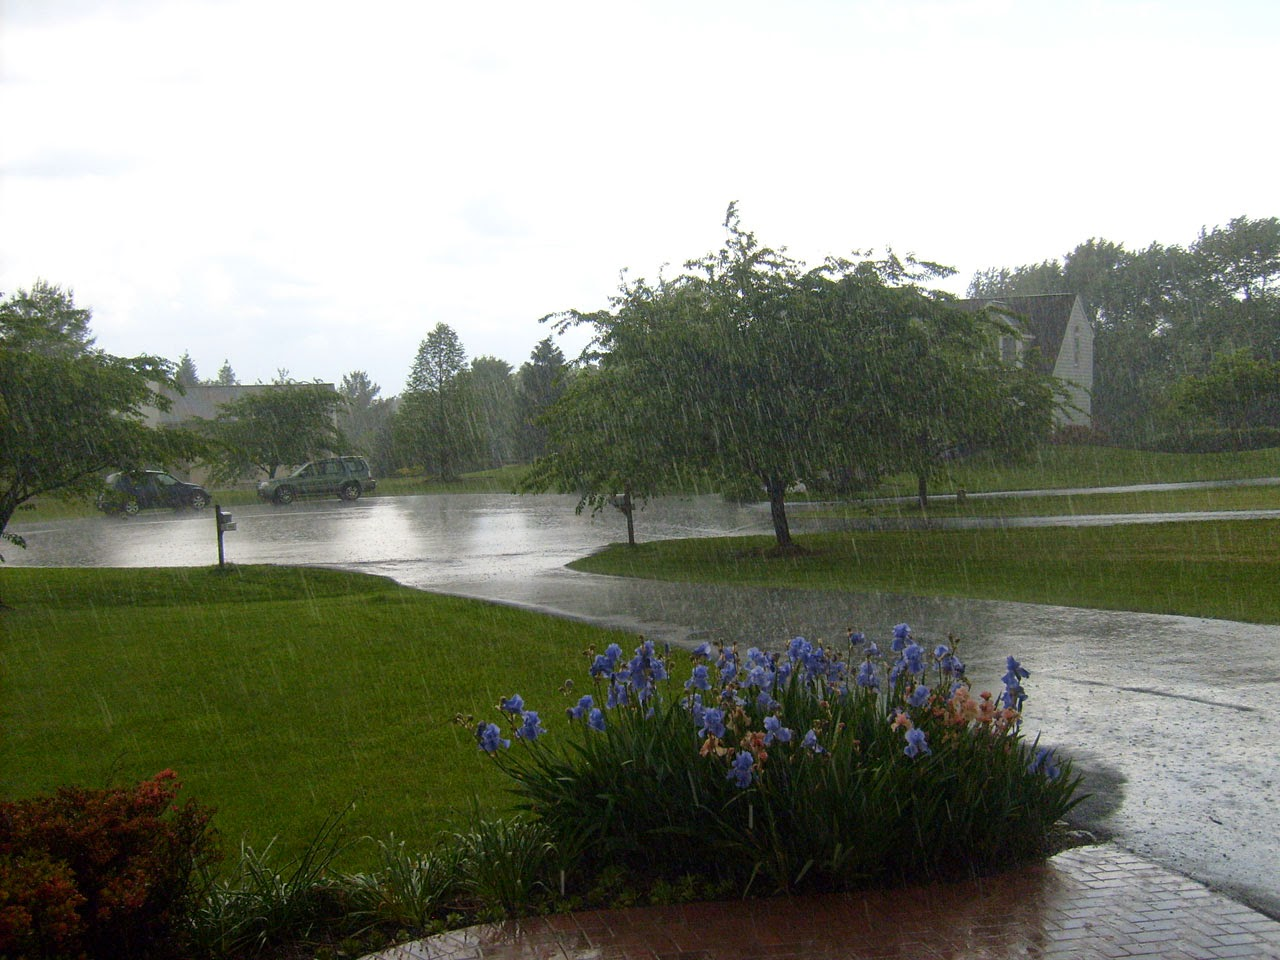 rainy season essay in urdu barsat ka mausam barish ka aik din beautiful day of rain